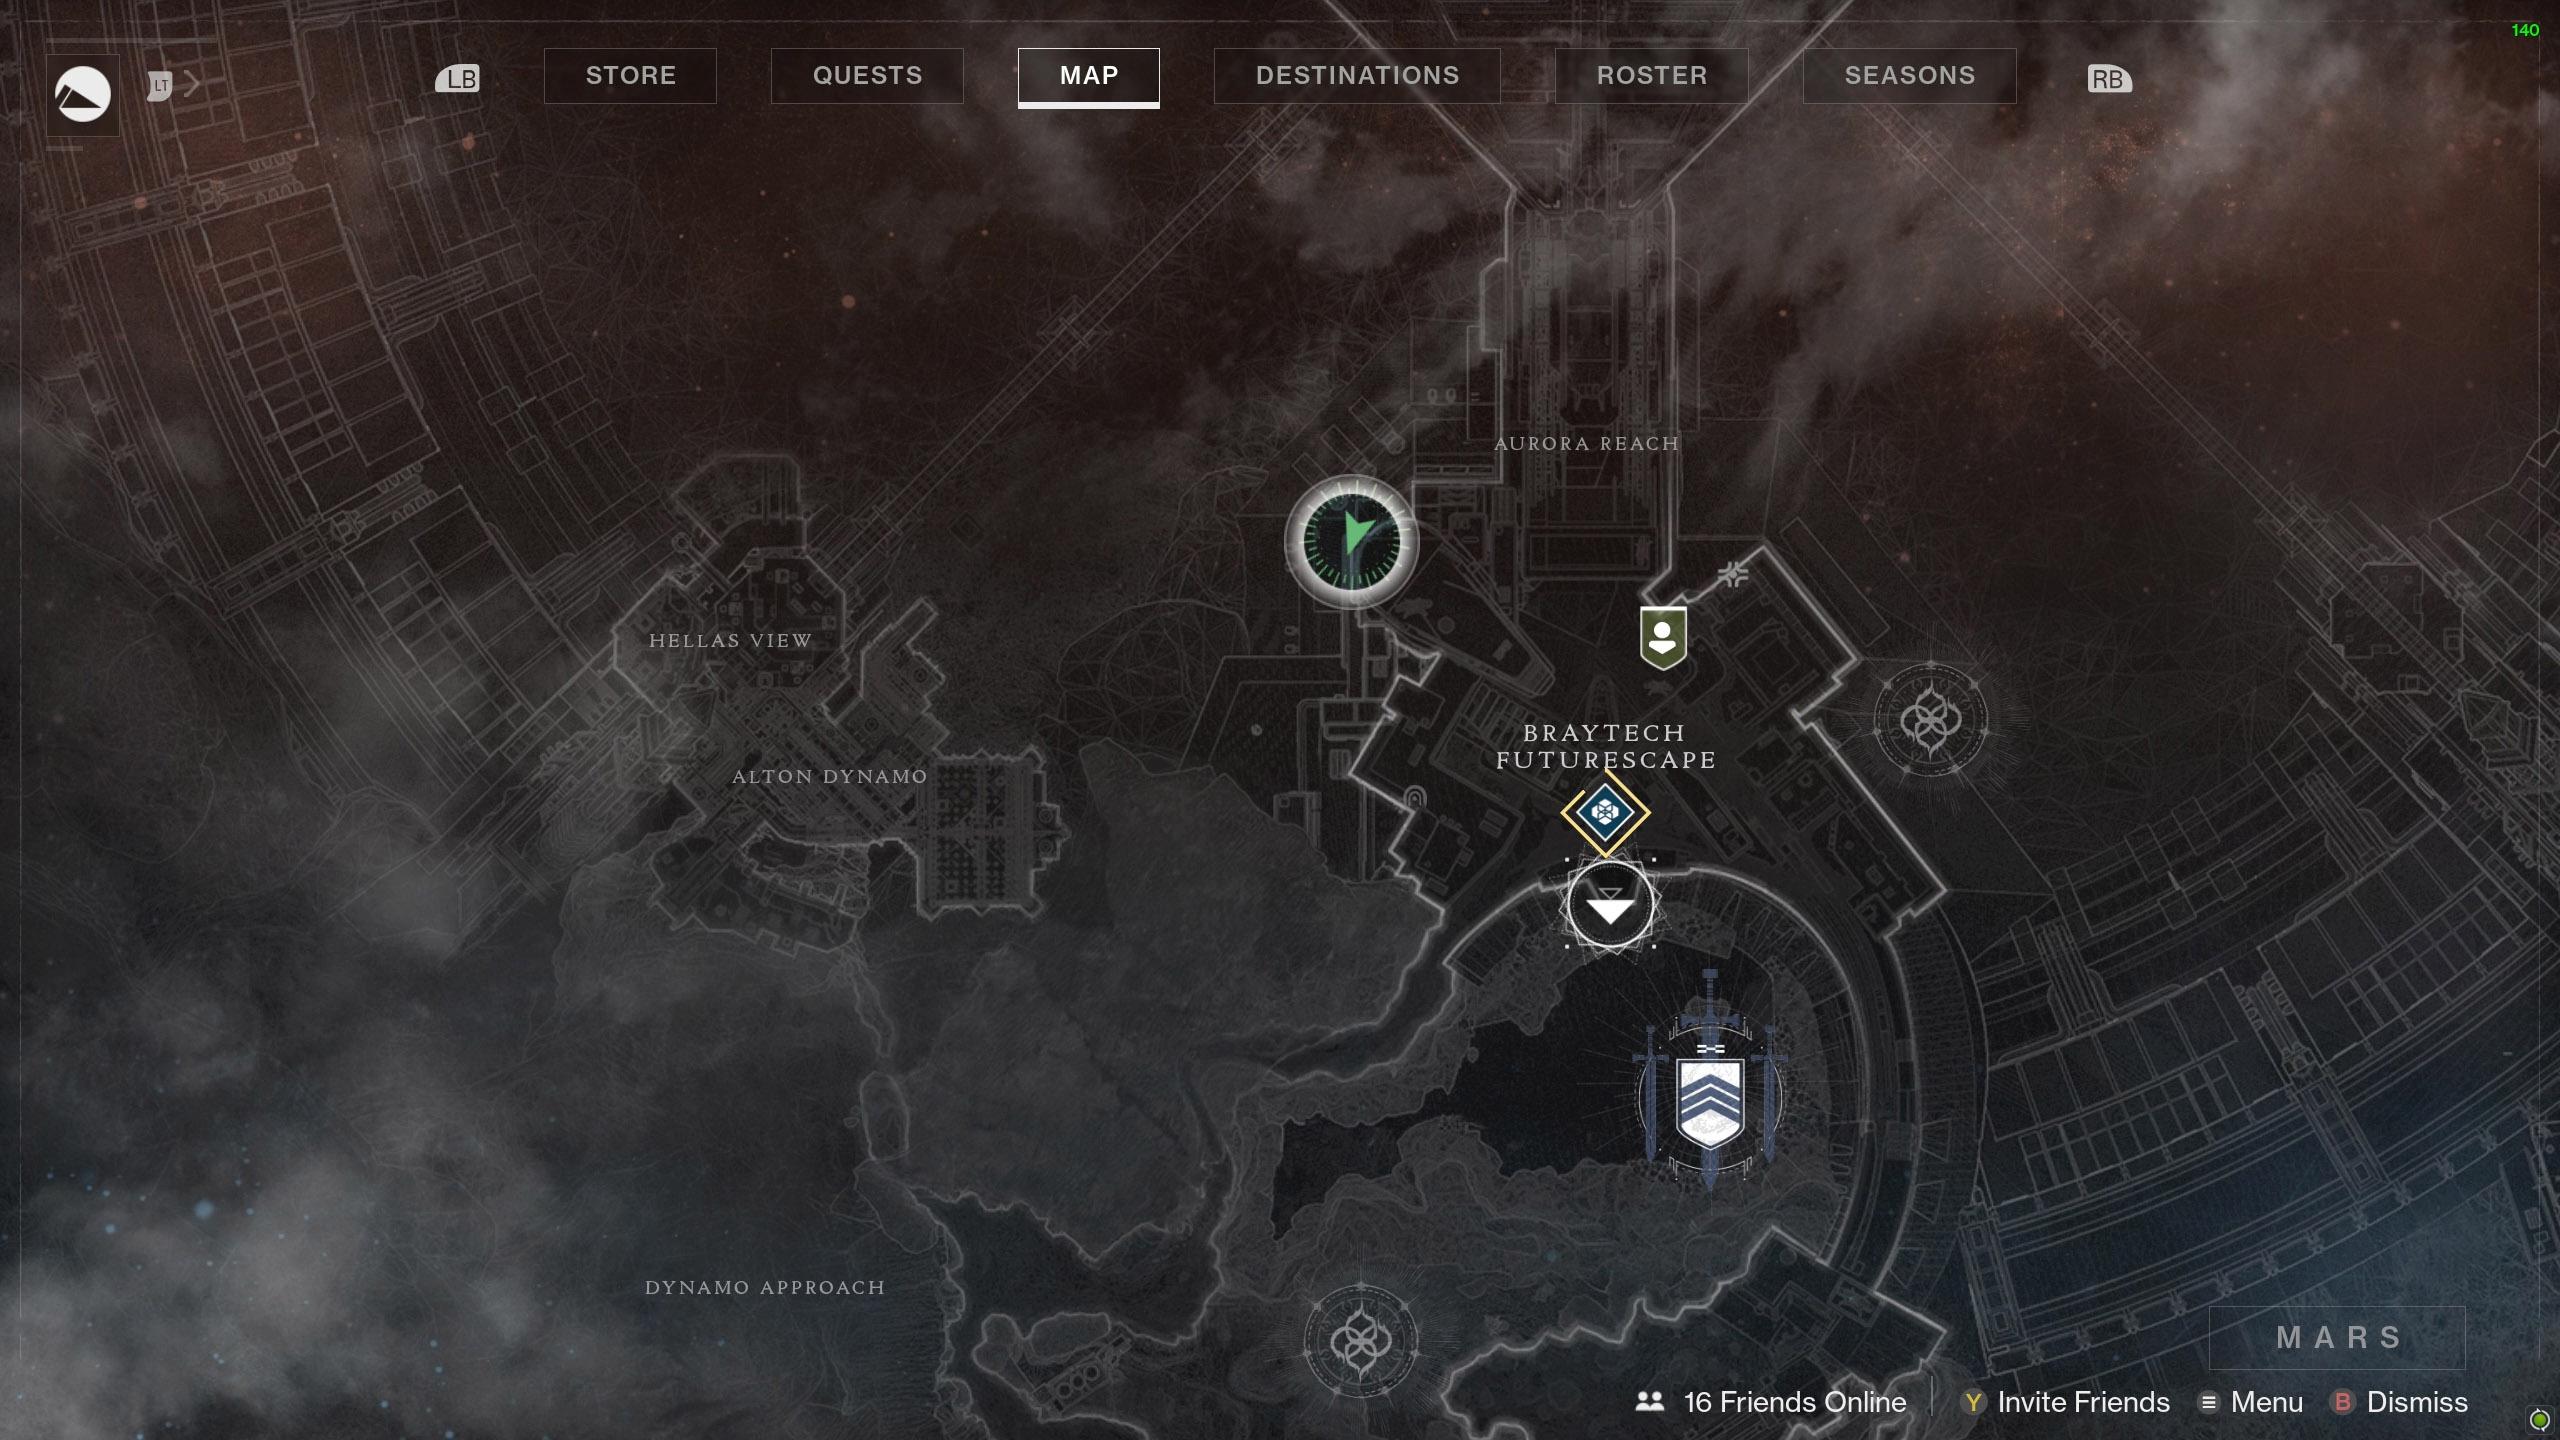 Destiny 2 Savathuns Eyes Mars Aurora Reach map